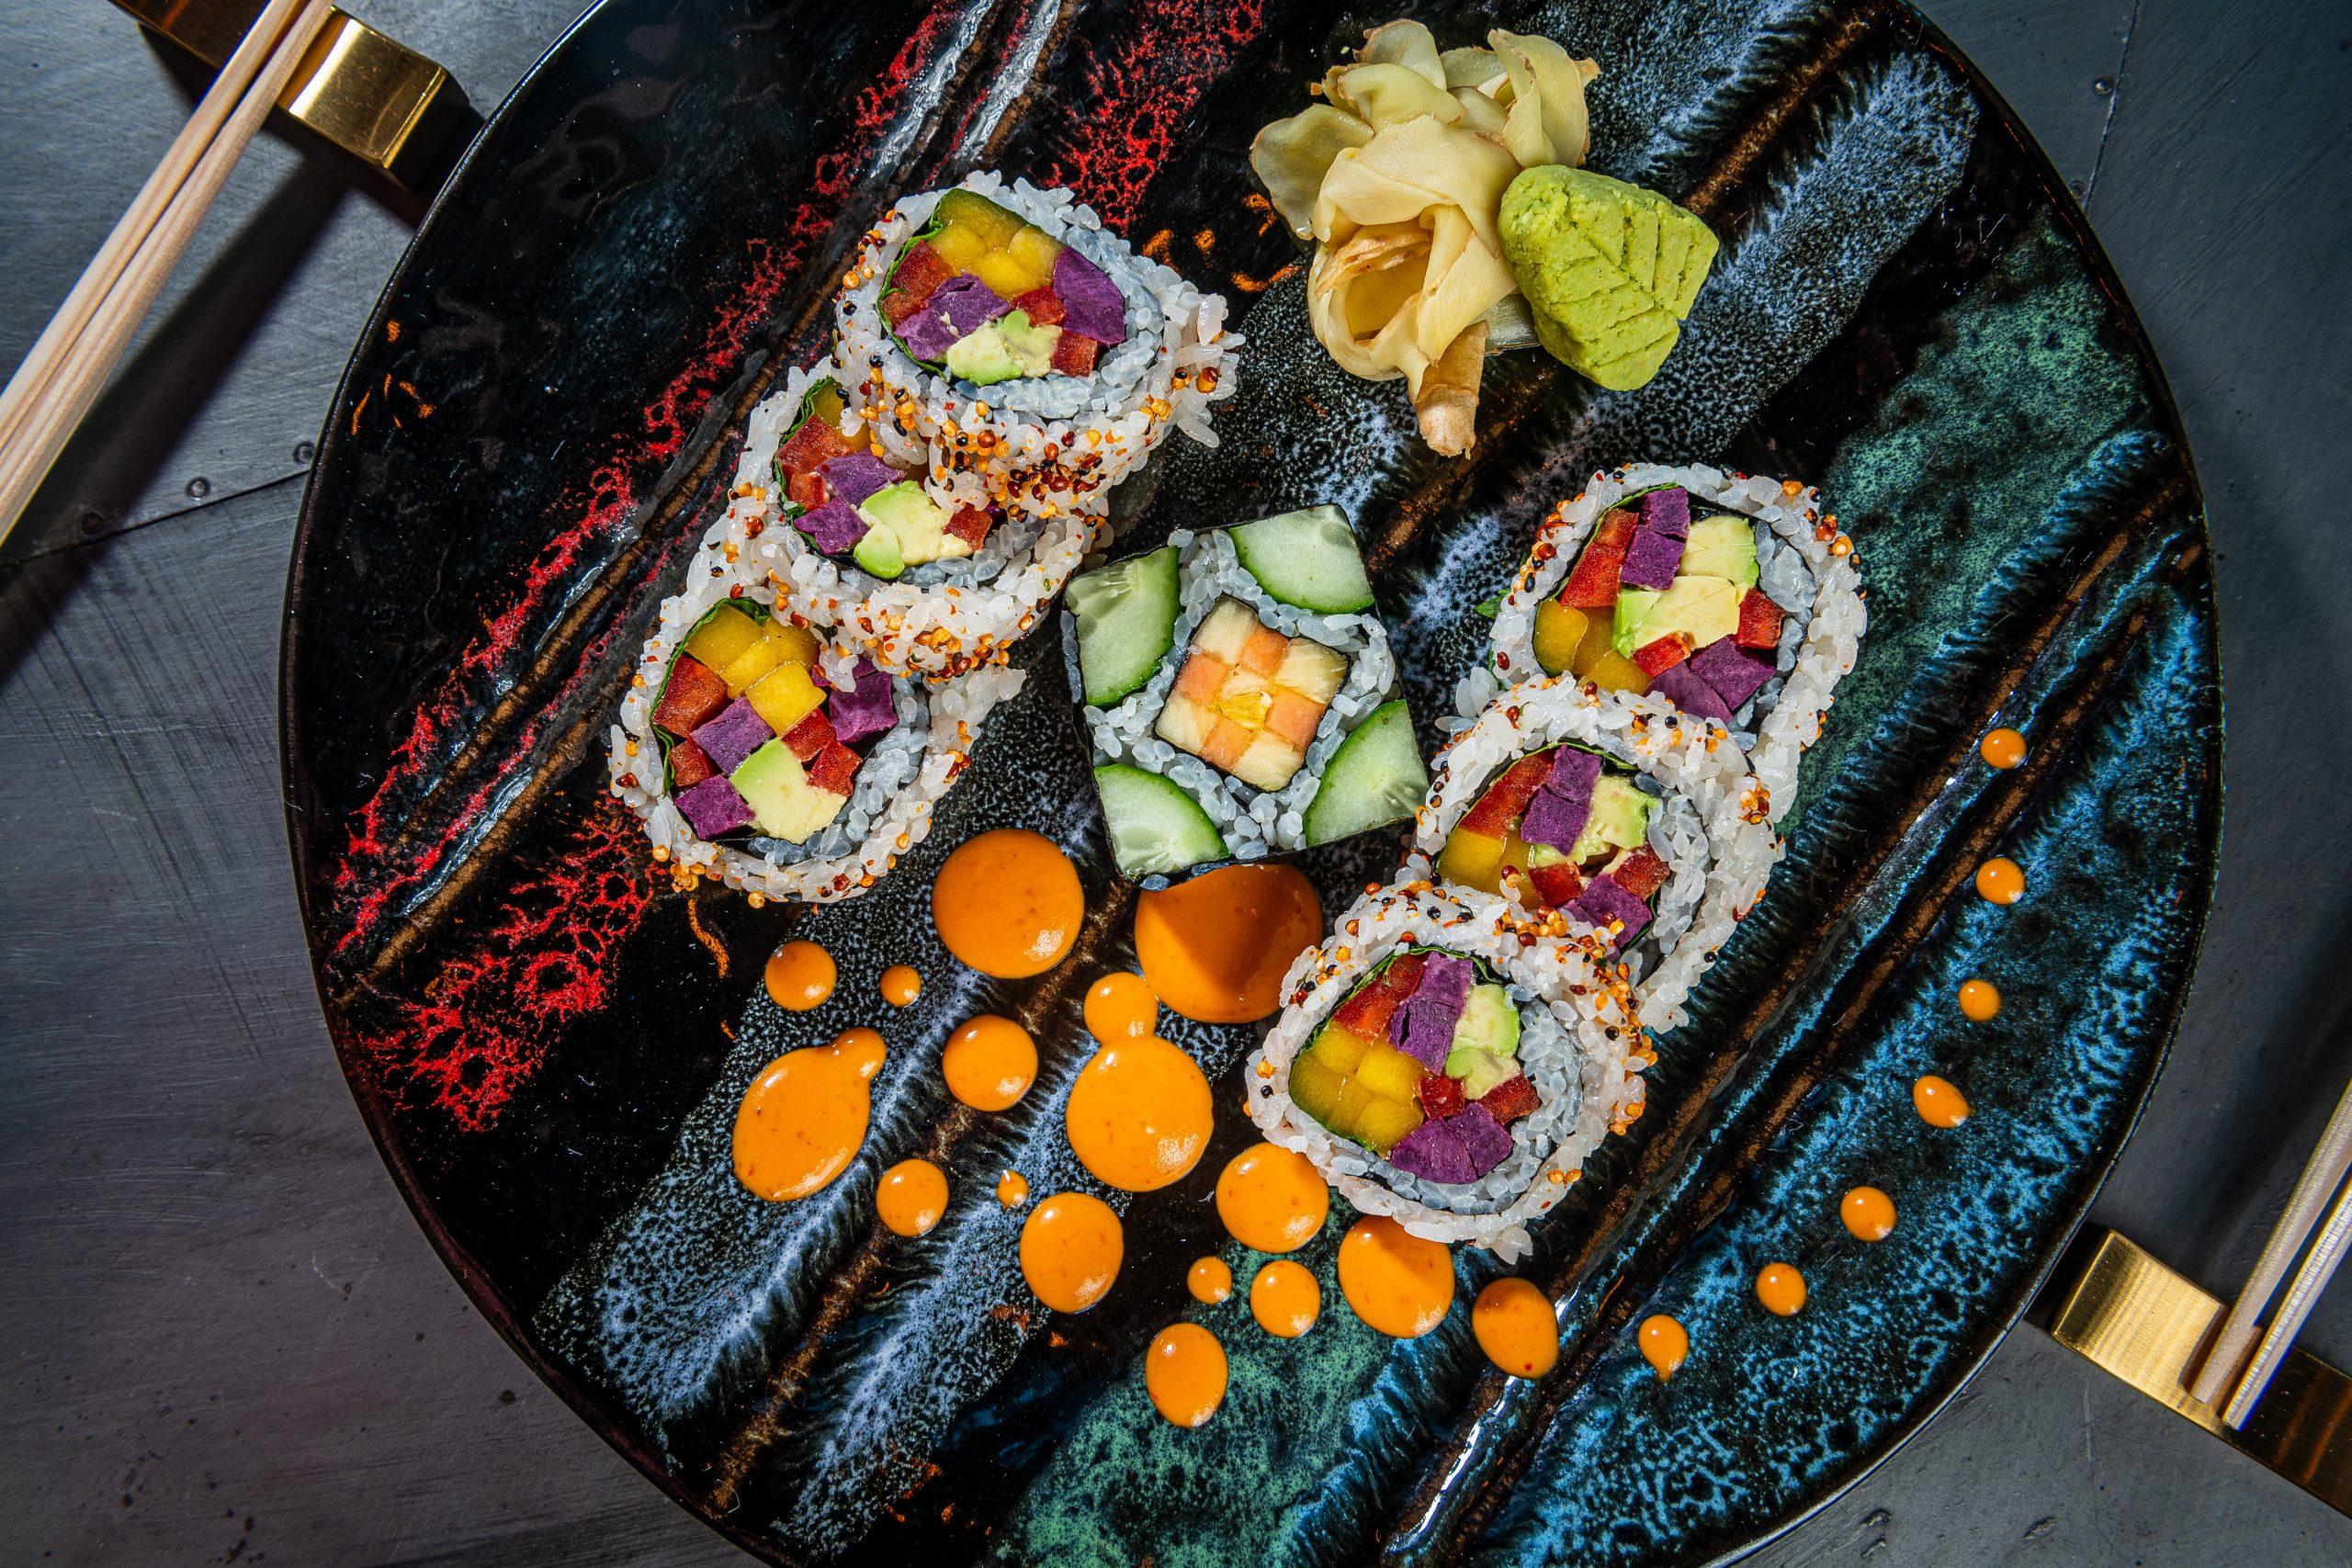 A selection of rolls at Yatai by NaRa-Ya